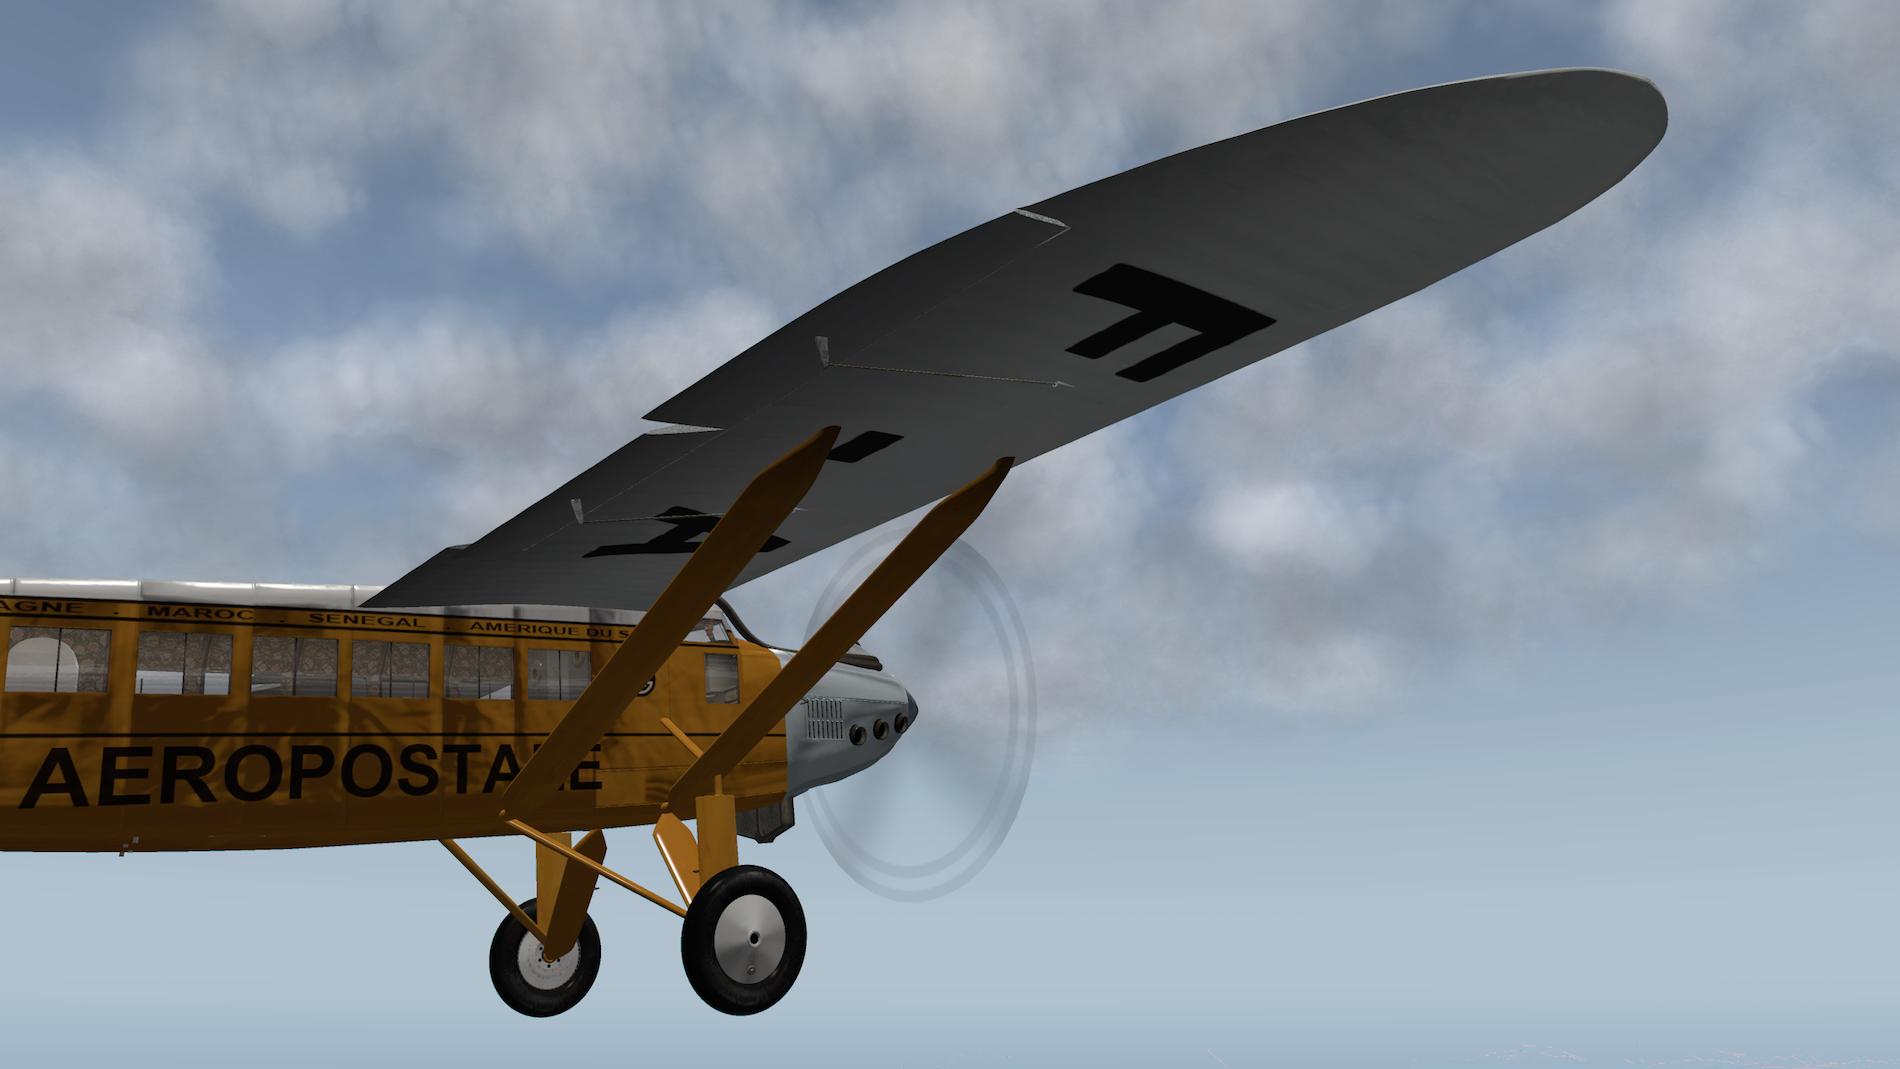 XPFR-Latécoère-28-01